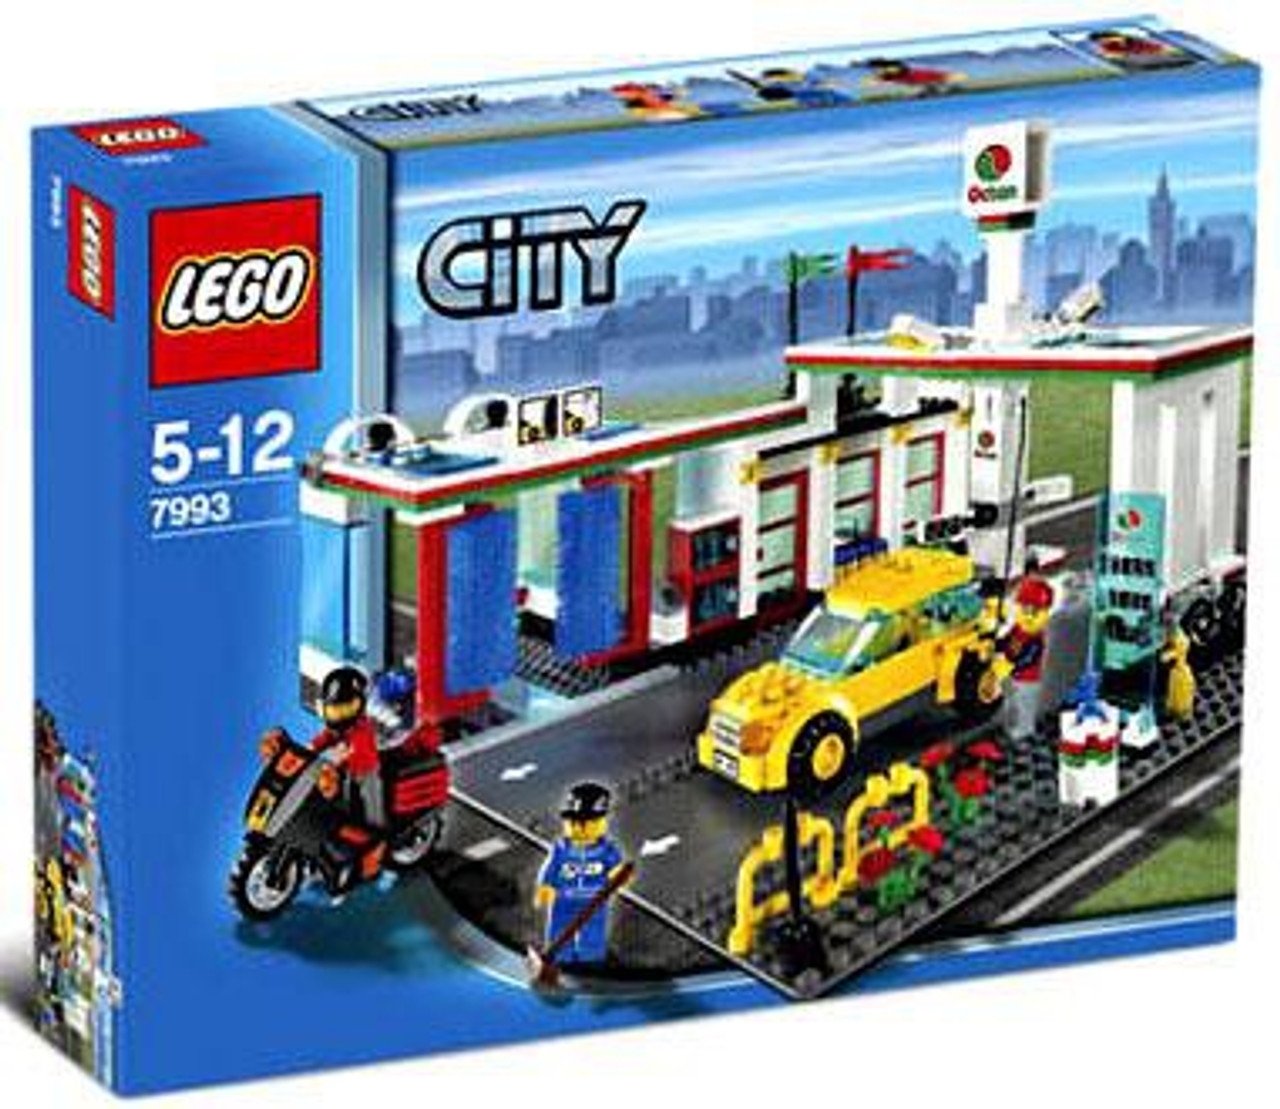 LEGO City Service Station Exclusive Set #7993